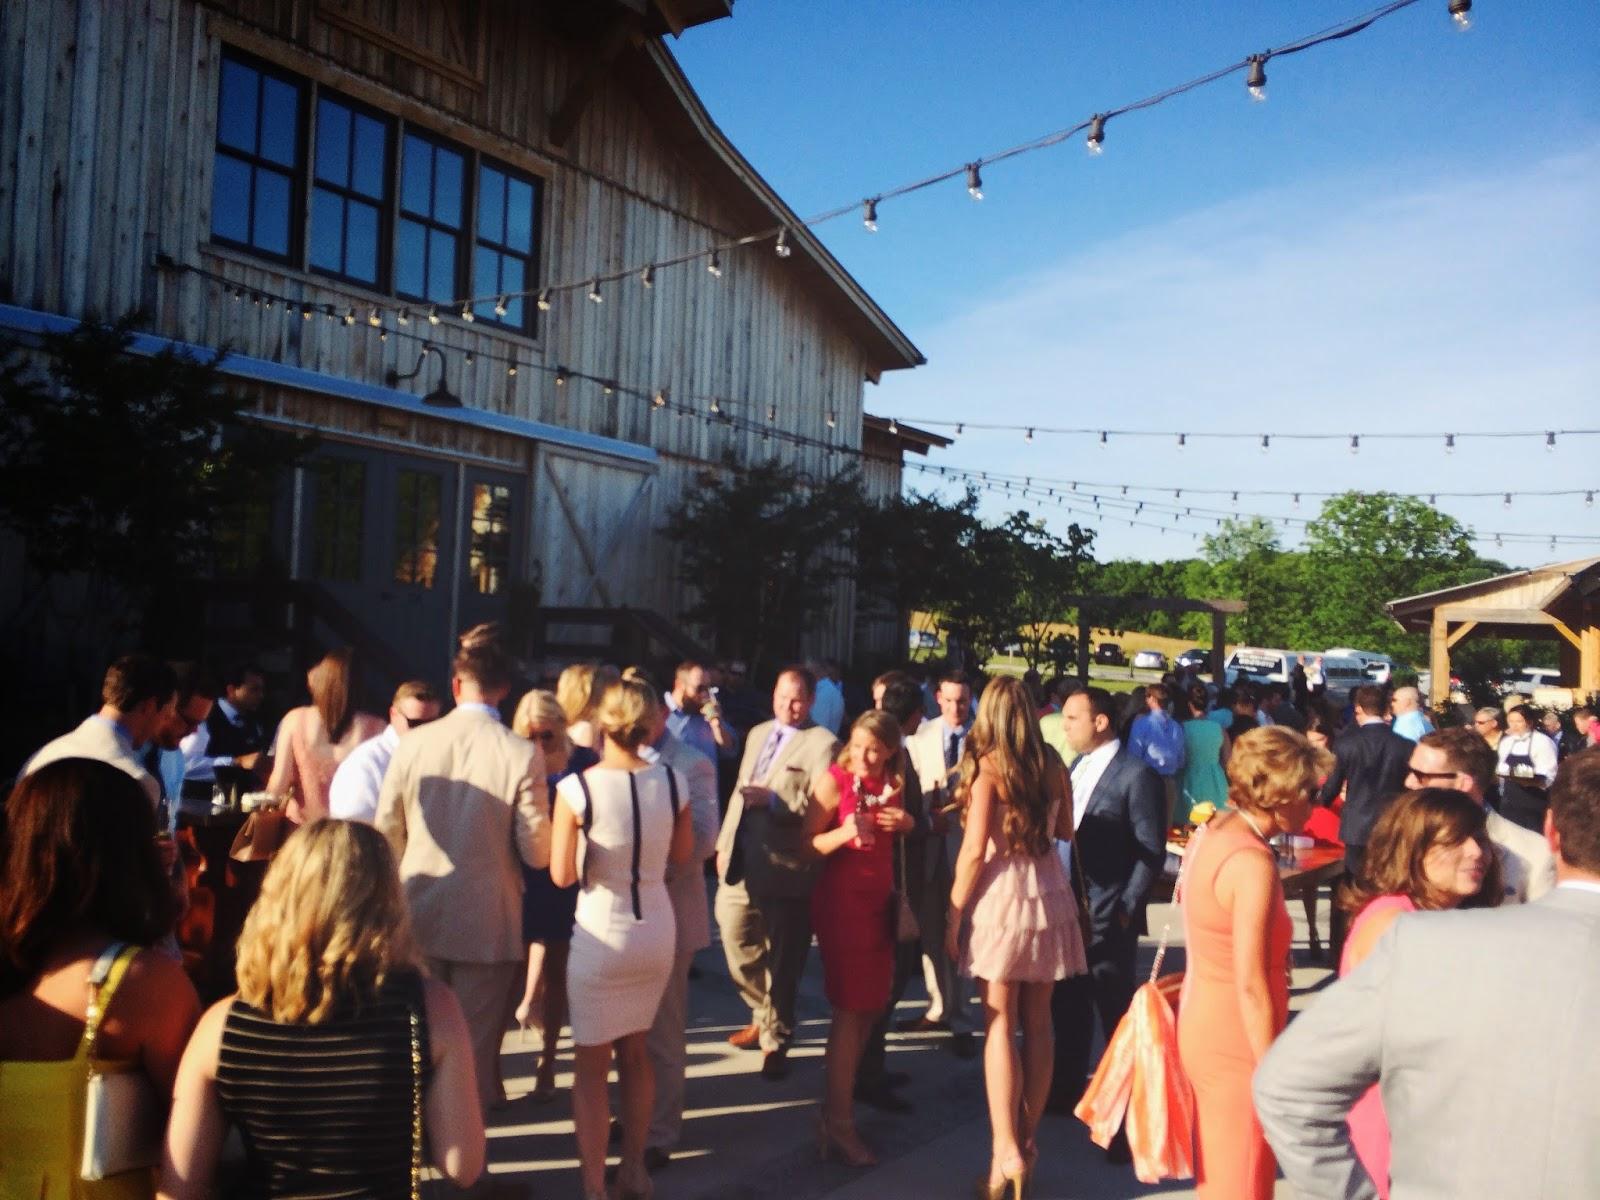 Mint Springs Farm, Mint Springs Farm Franklin, Mint Springs Farm Wedding, Mint Springs Farm Tennessee, Tennessee Wedding